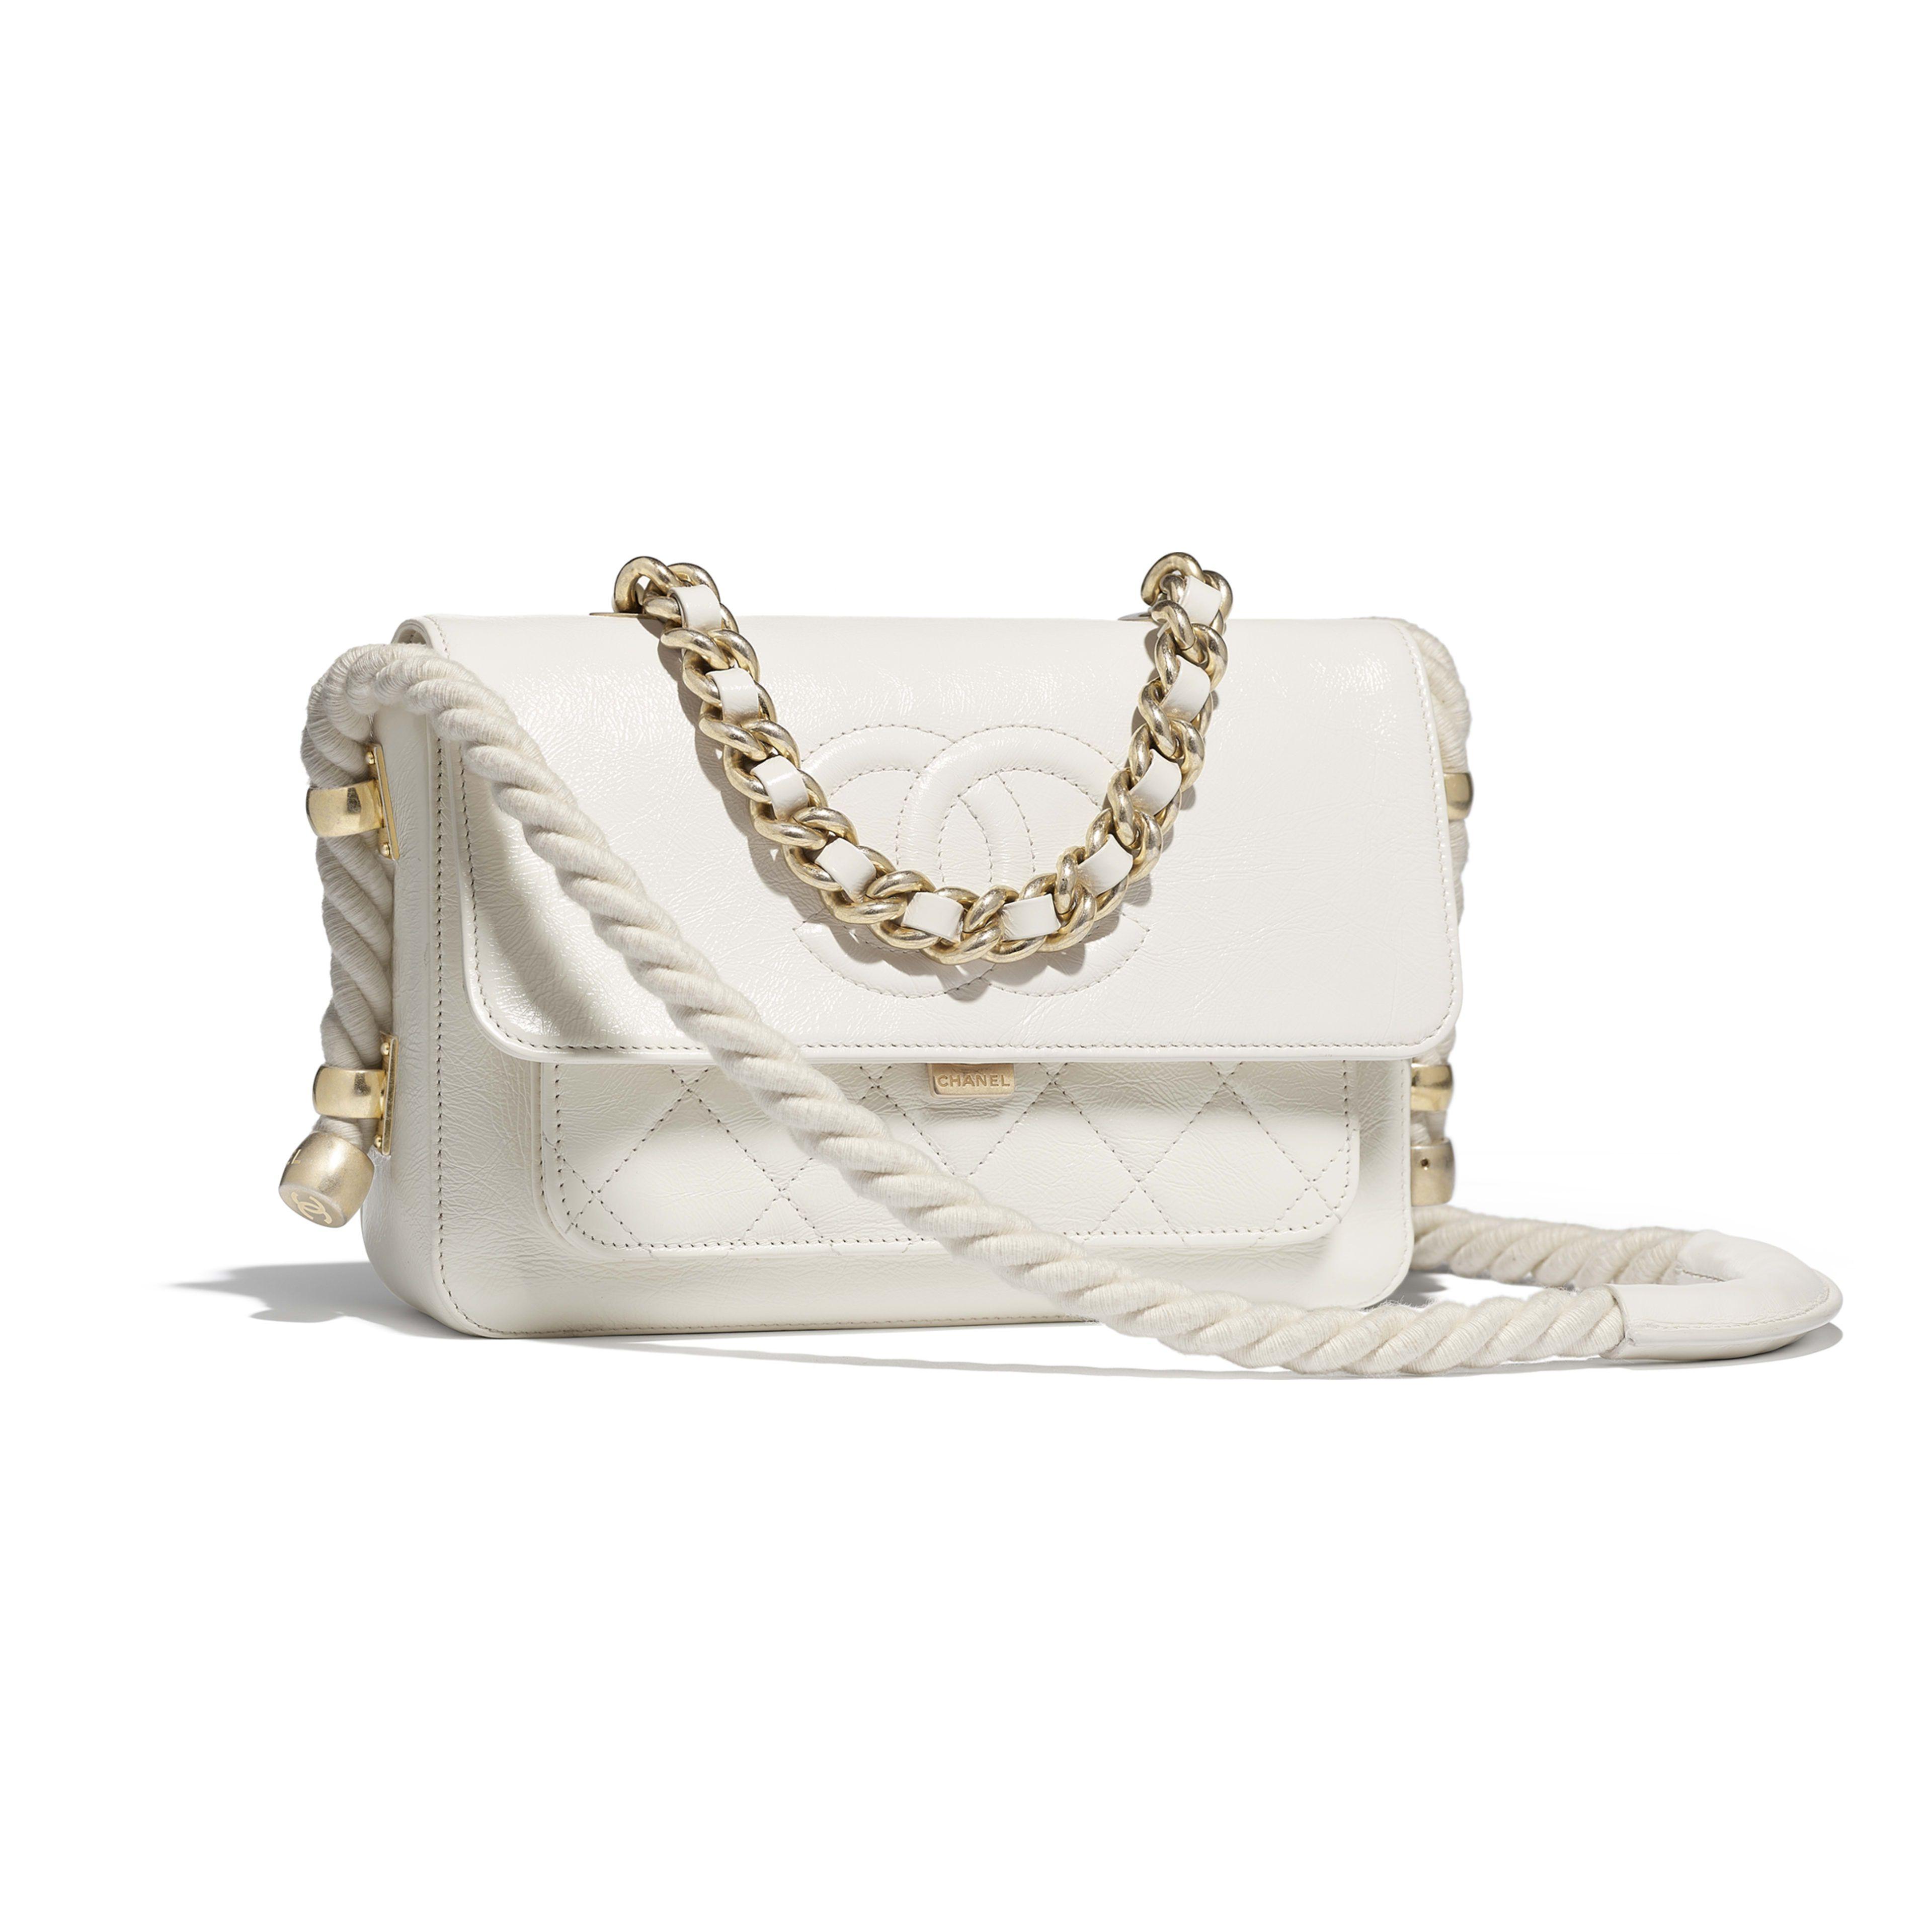 7fae6429da Flap Bag - White - Crumpled Calfskin